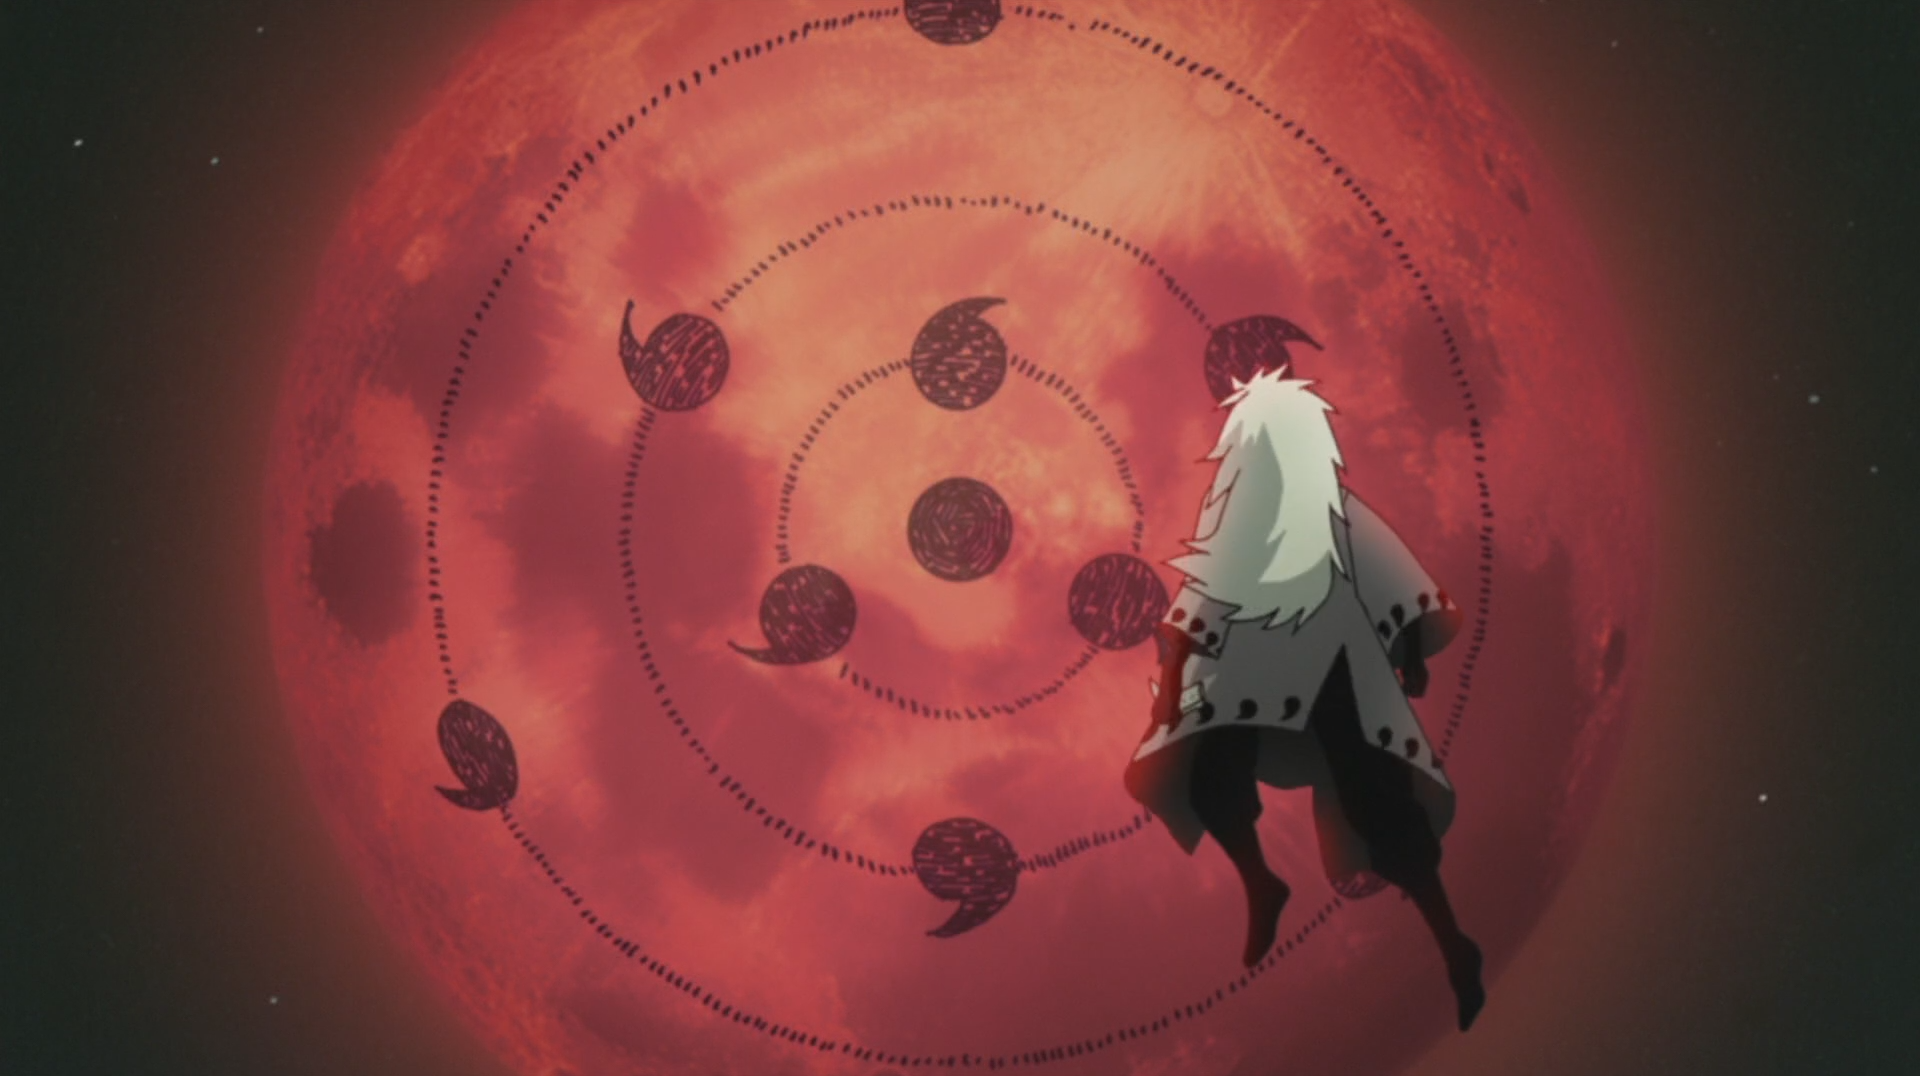 Naruto Shipudden: Jutsu Terkuat Mata Sharingan Dalam Sejarah Shinobi 10